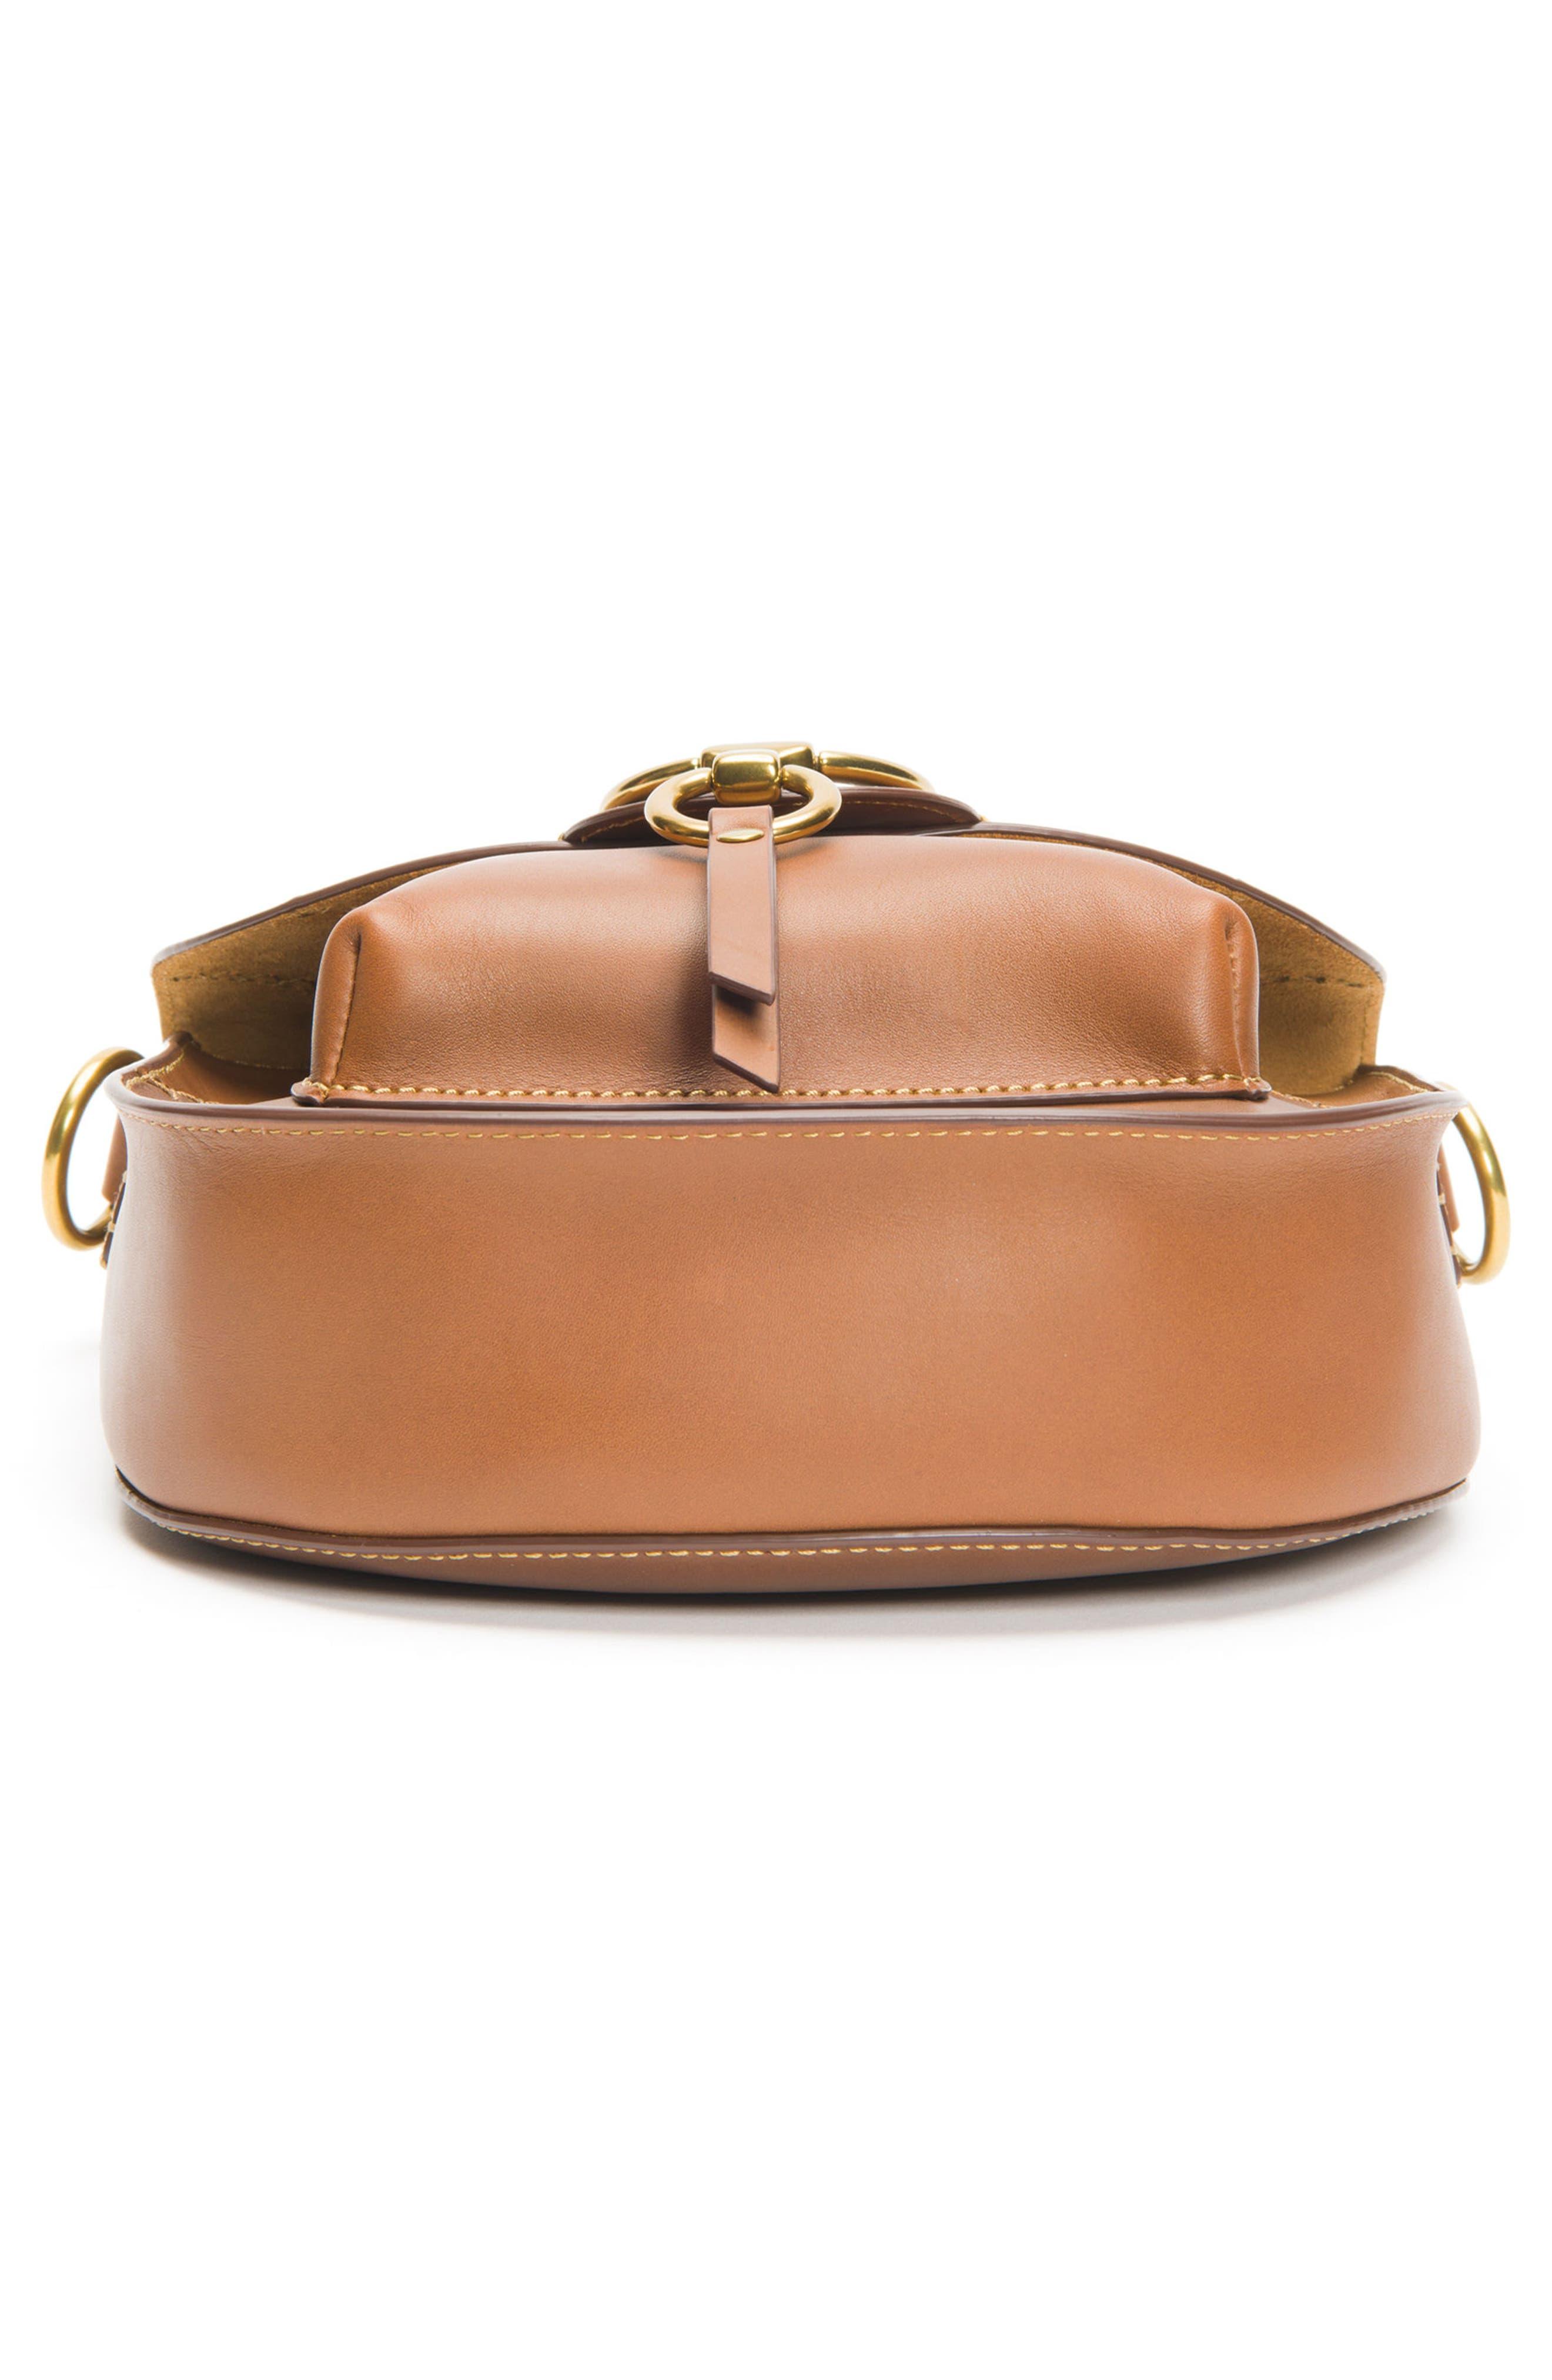 Ilana Colorblock Leather Saddle Bag,                             Alternate thumbnail 6, color,                             200